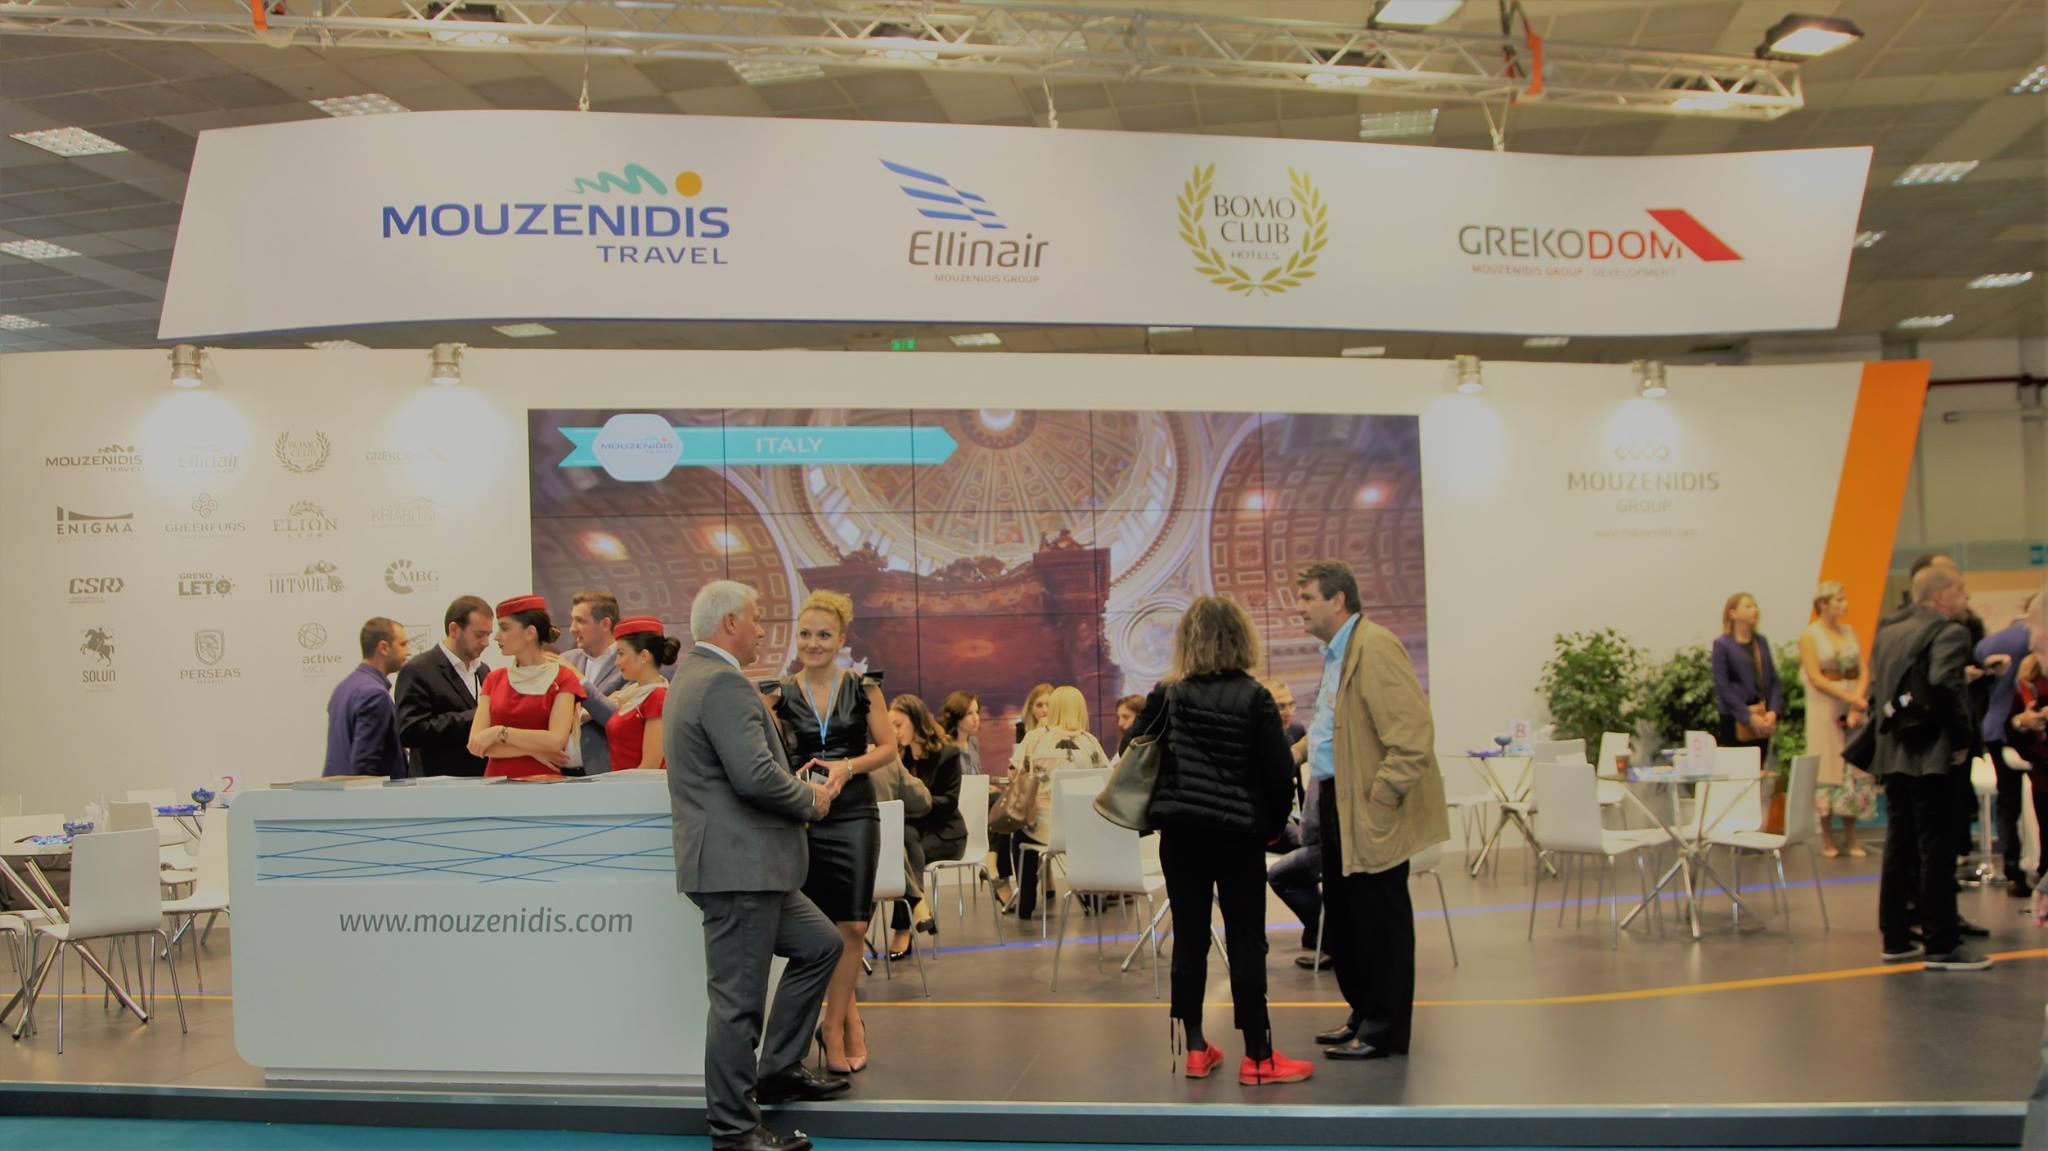 H Ellinair συμμετείχε και φέτος στην 33η Διεθνή Έκθεση Τουρισμού PHILOXENIA